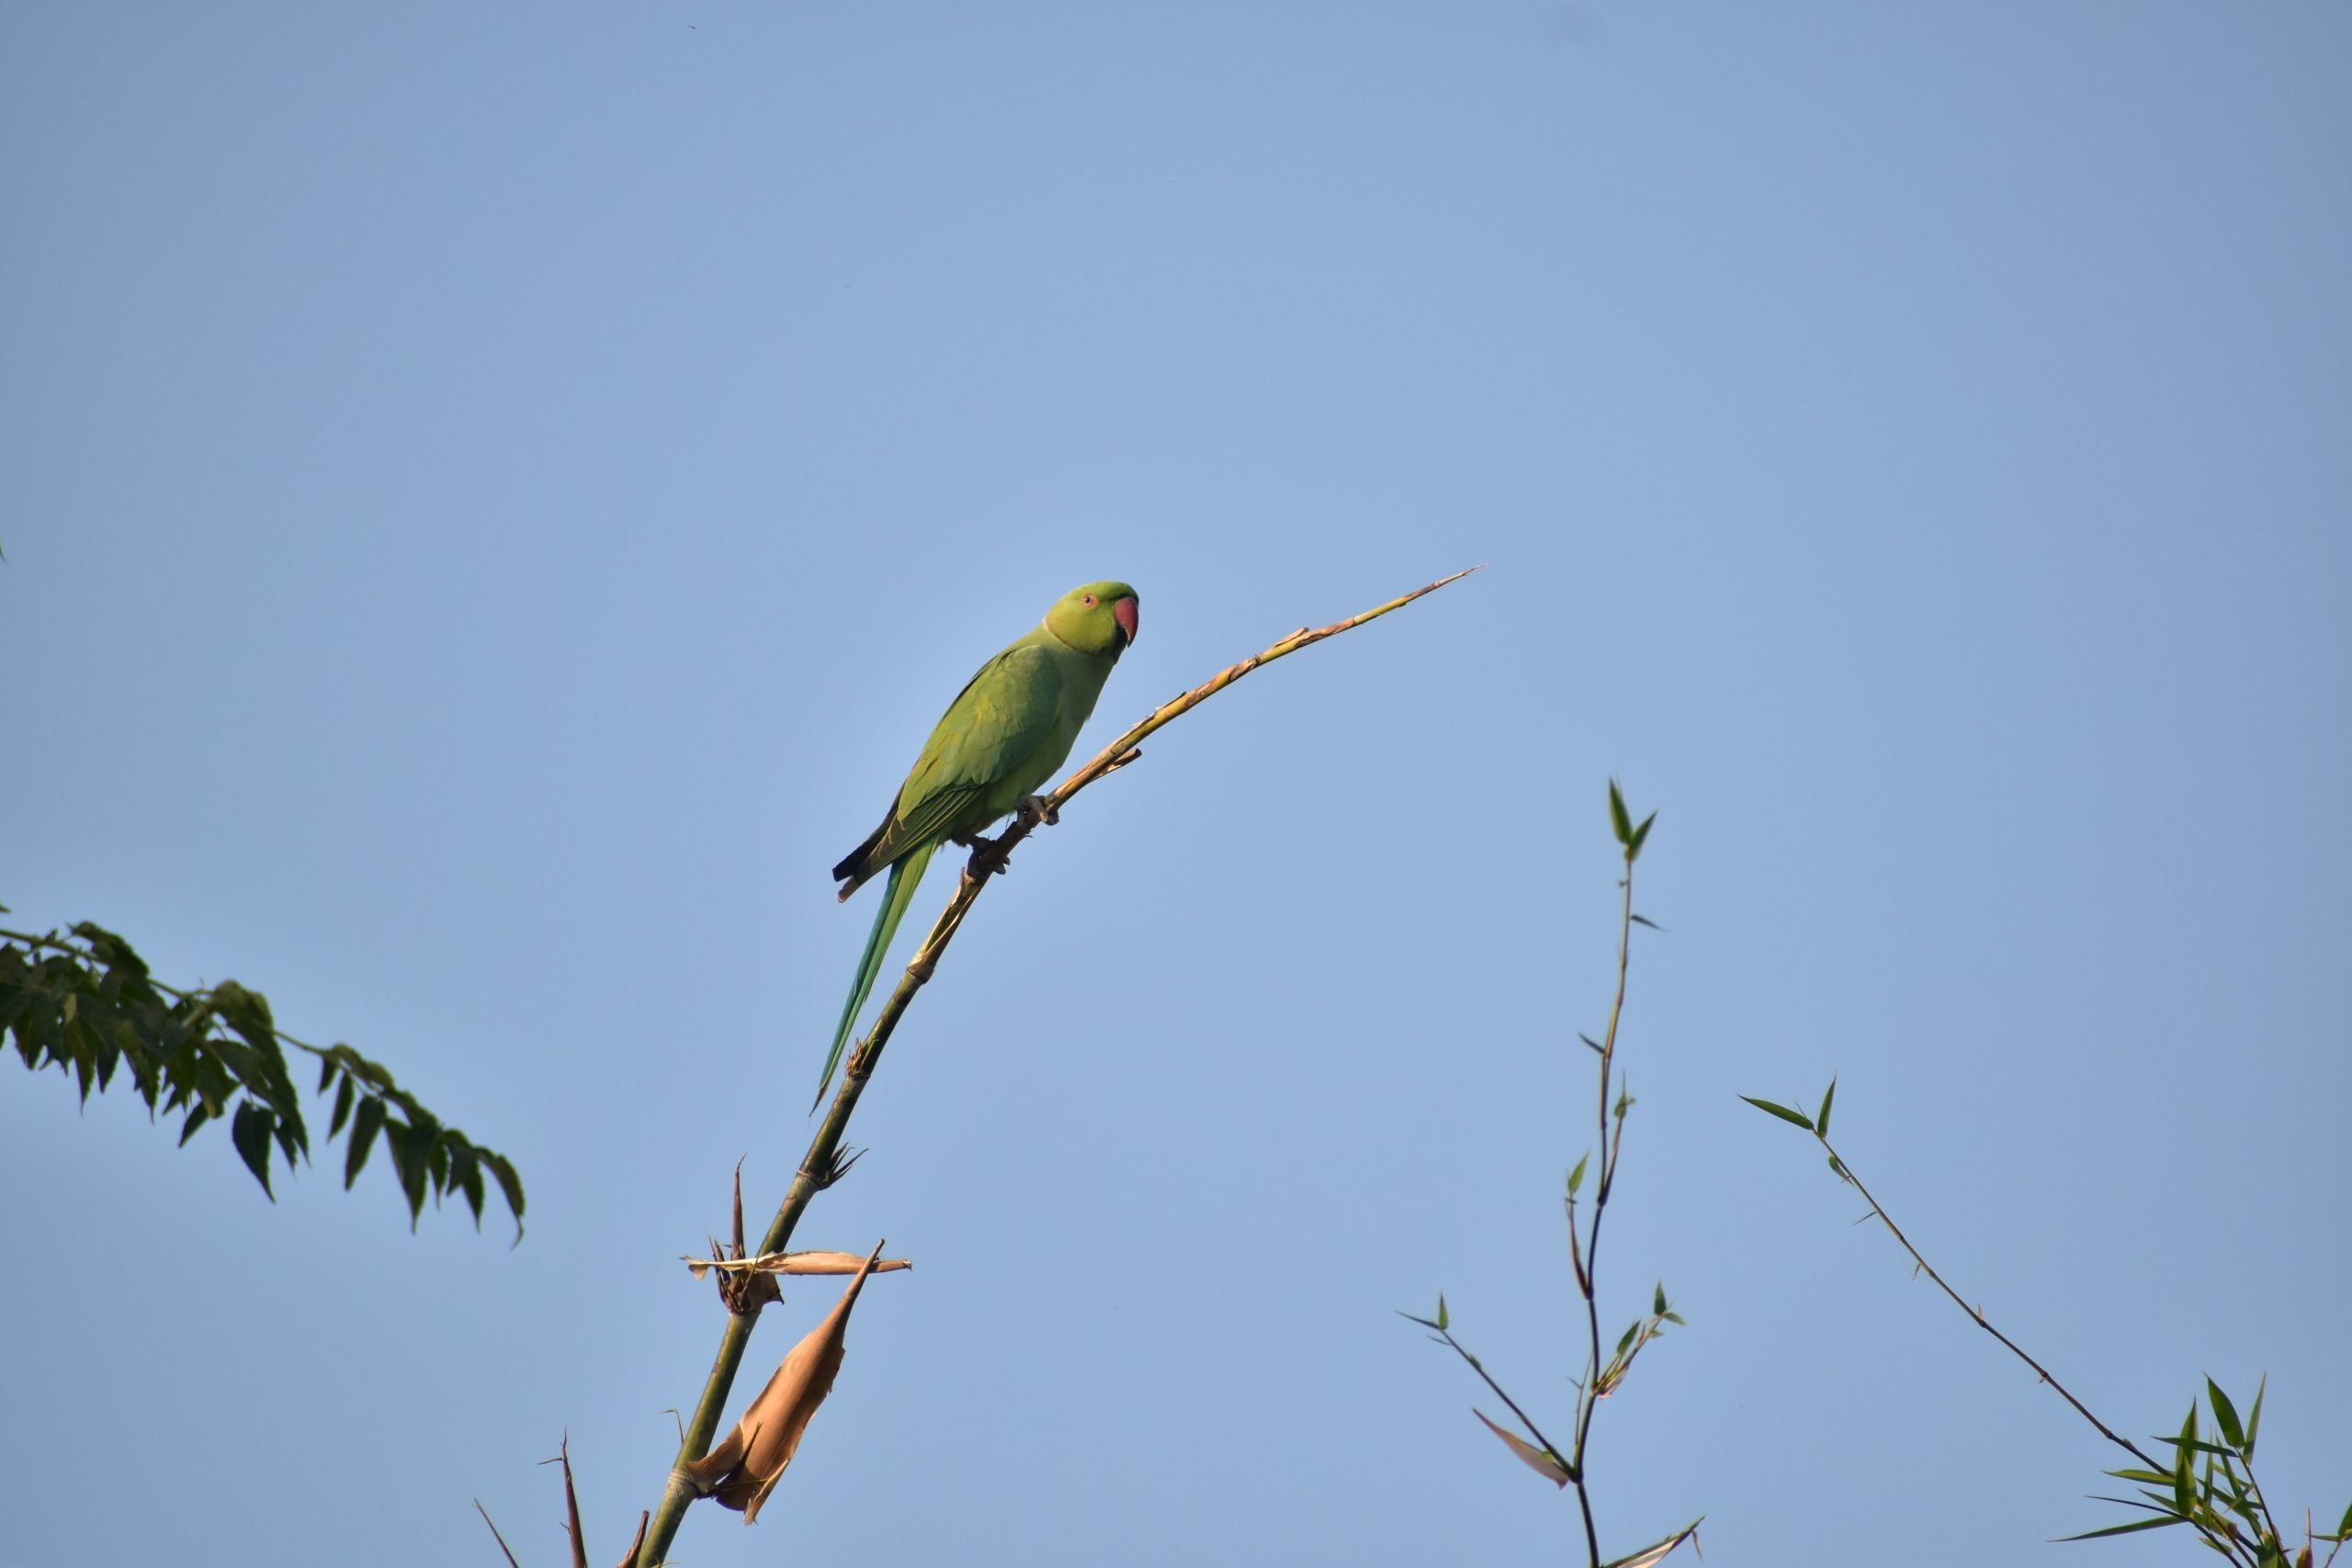 parrot on a stem